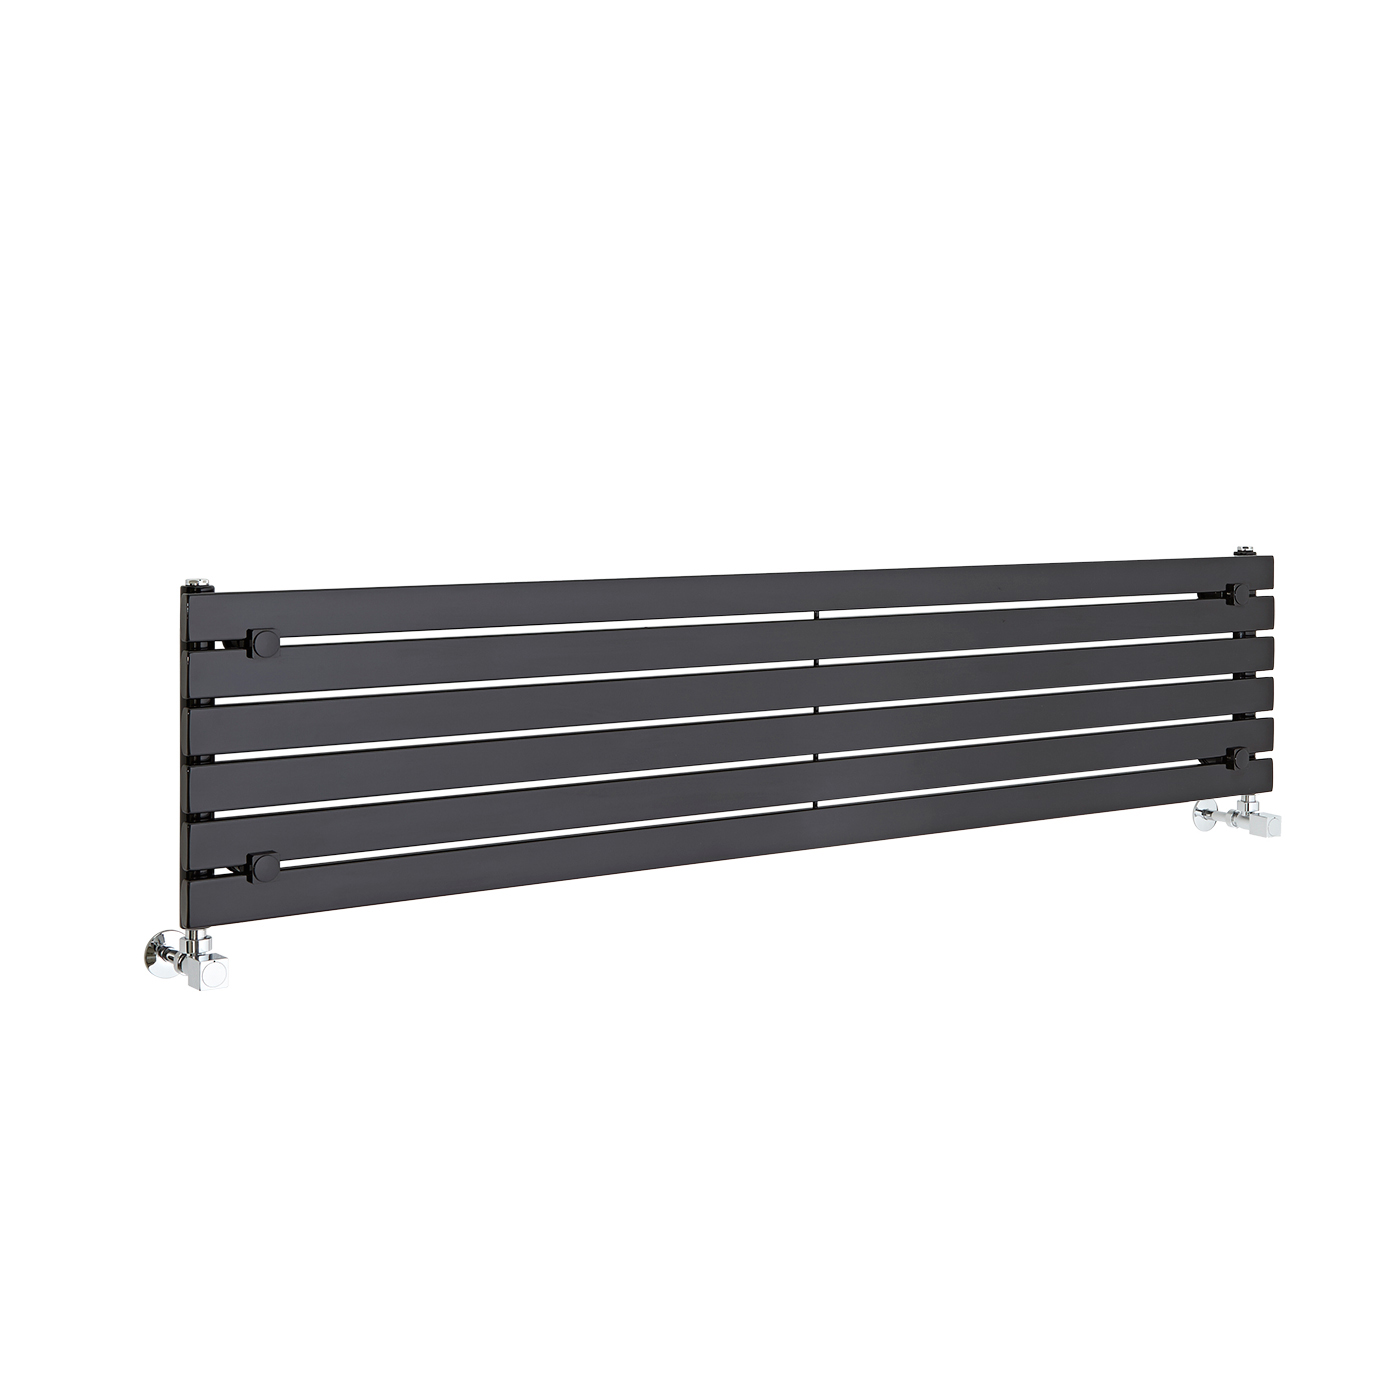 Radiador de Diseño Horizontal - Negro Lúcido - 354mm x 1600mm x 54mm - 773 Vatios - Sloane